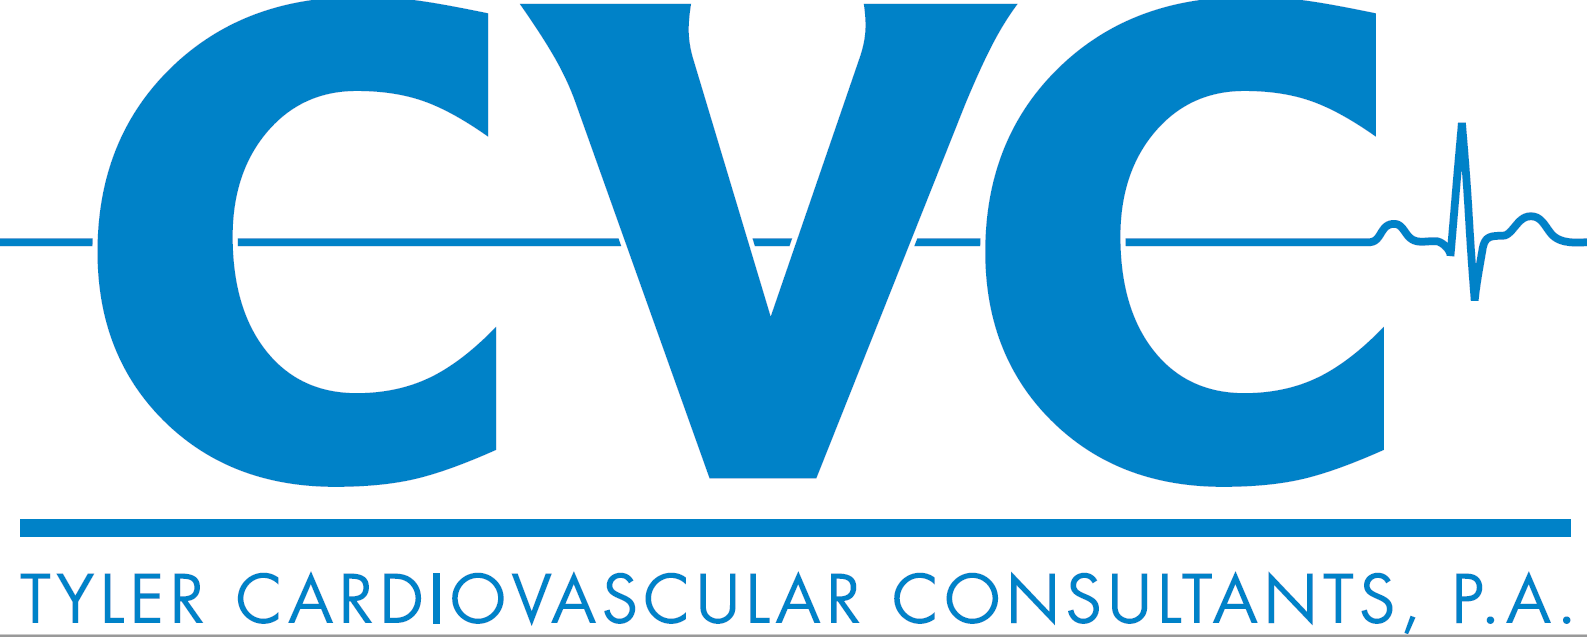 Tyler CardioVascular Consultants Sponsor Logo